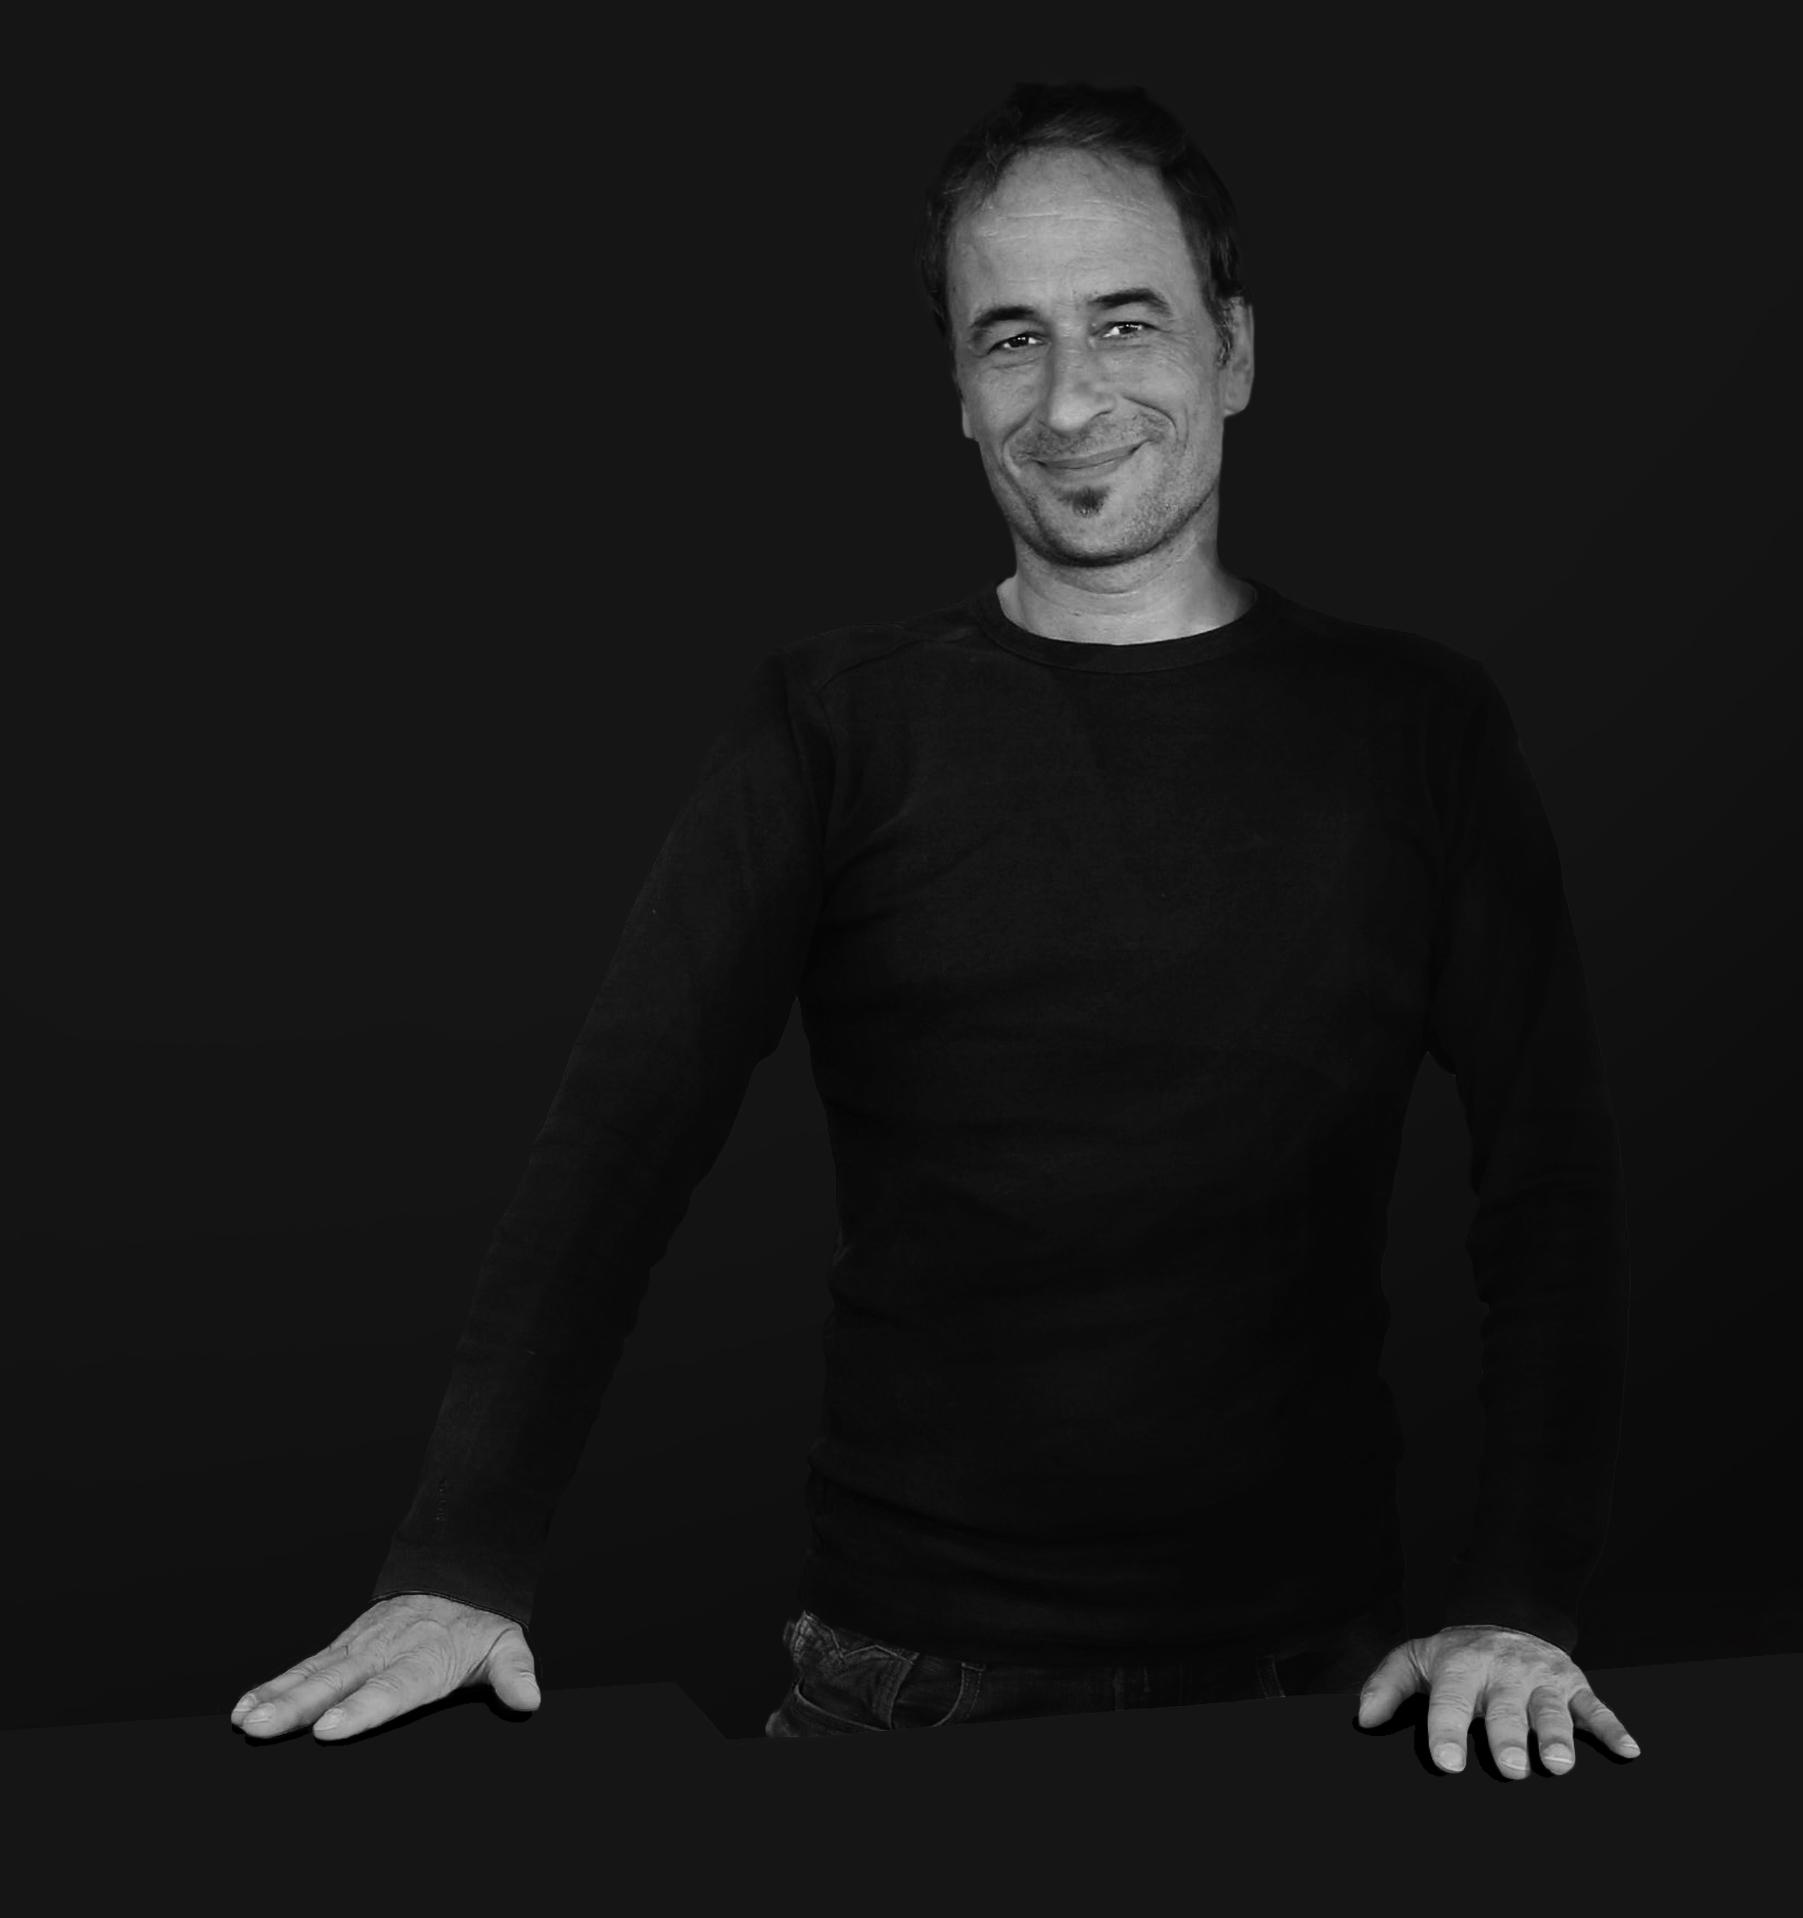 Dietmar Enzinger